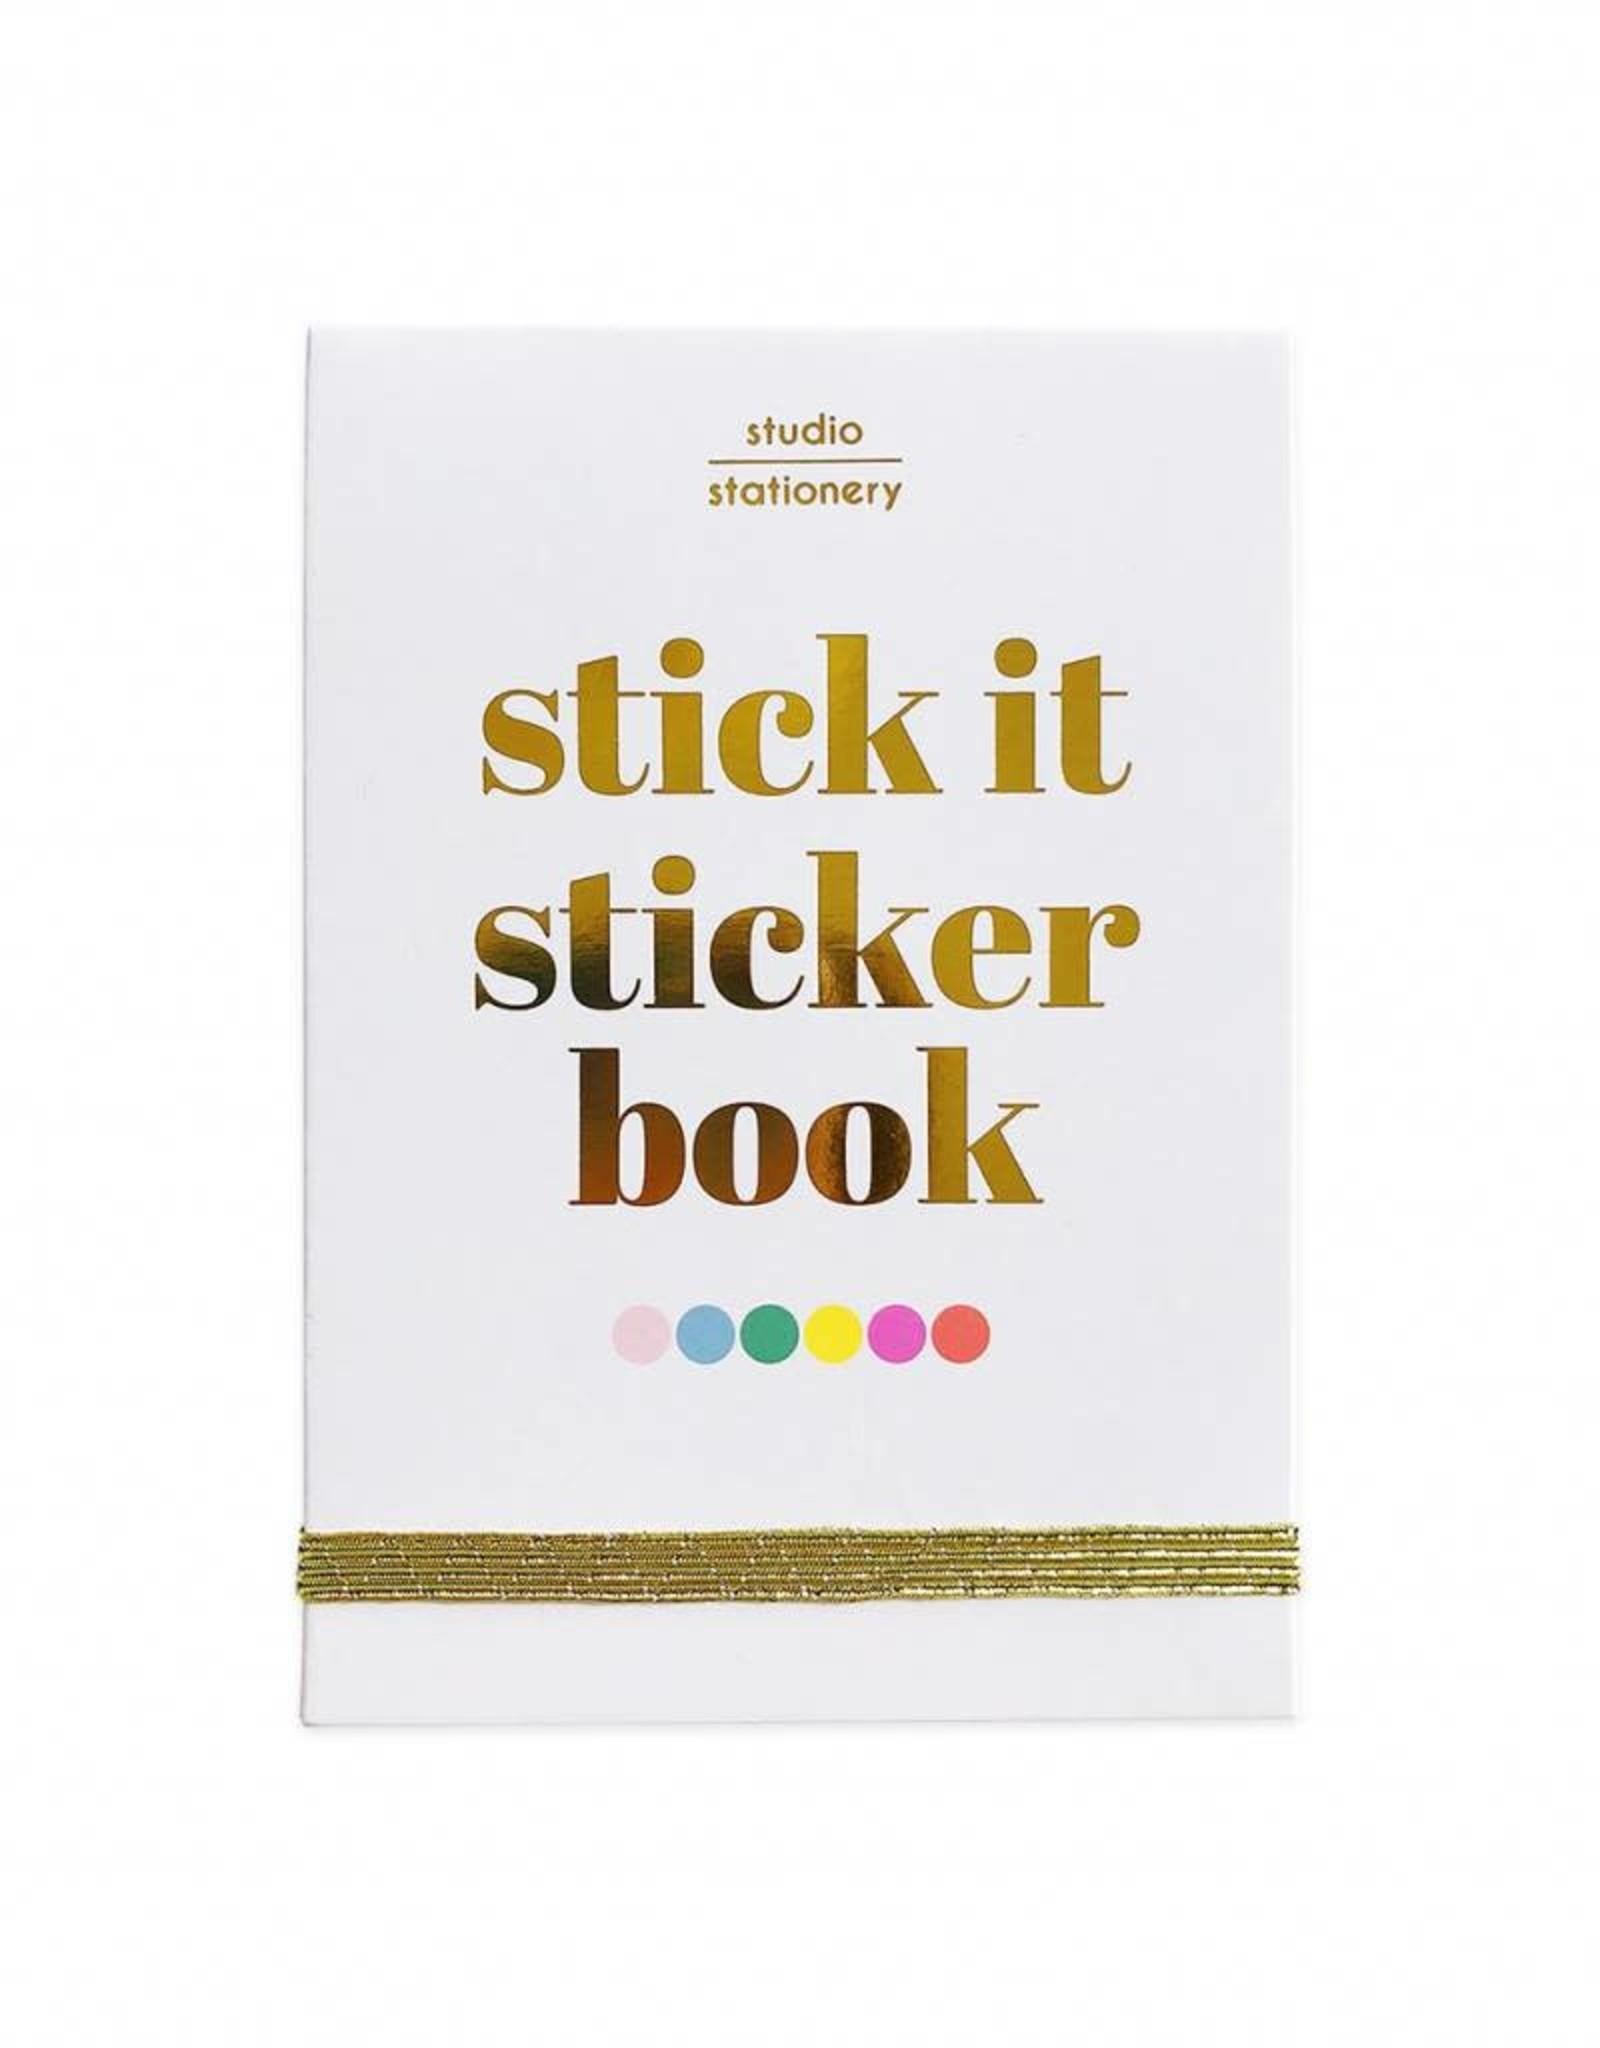 studio stationery Studio stationery stick it sticker book